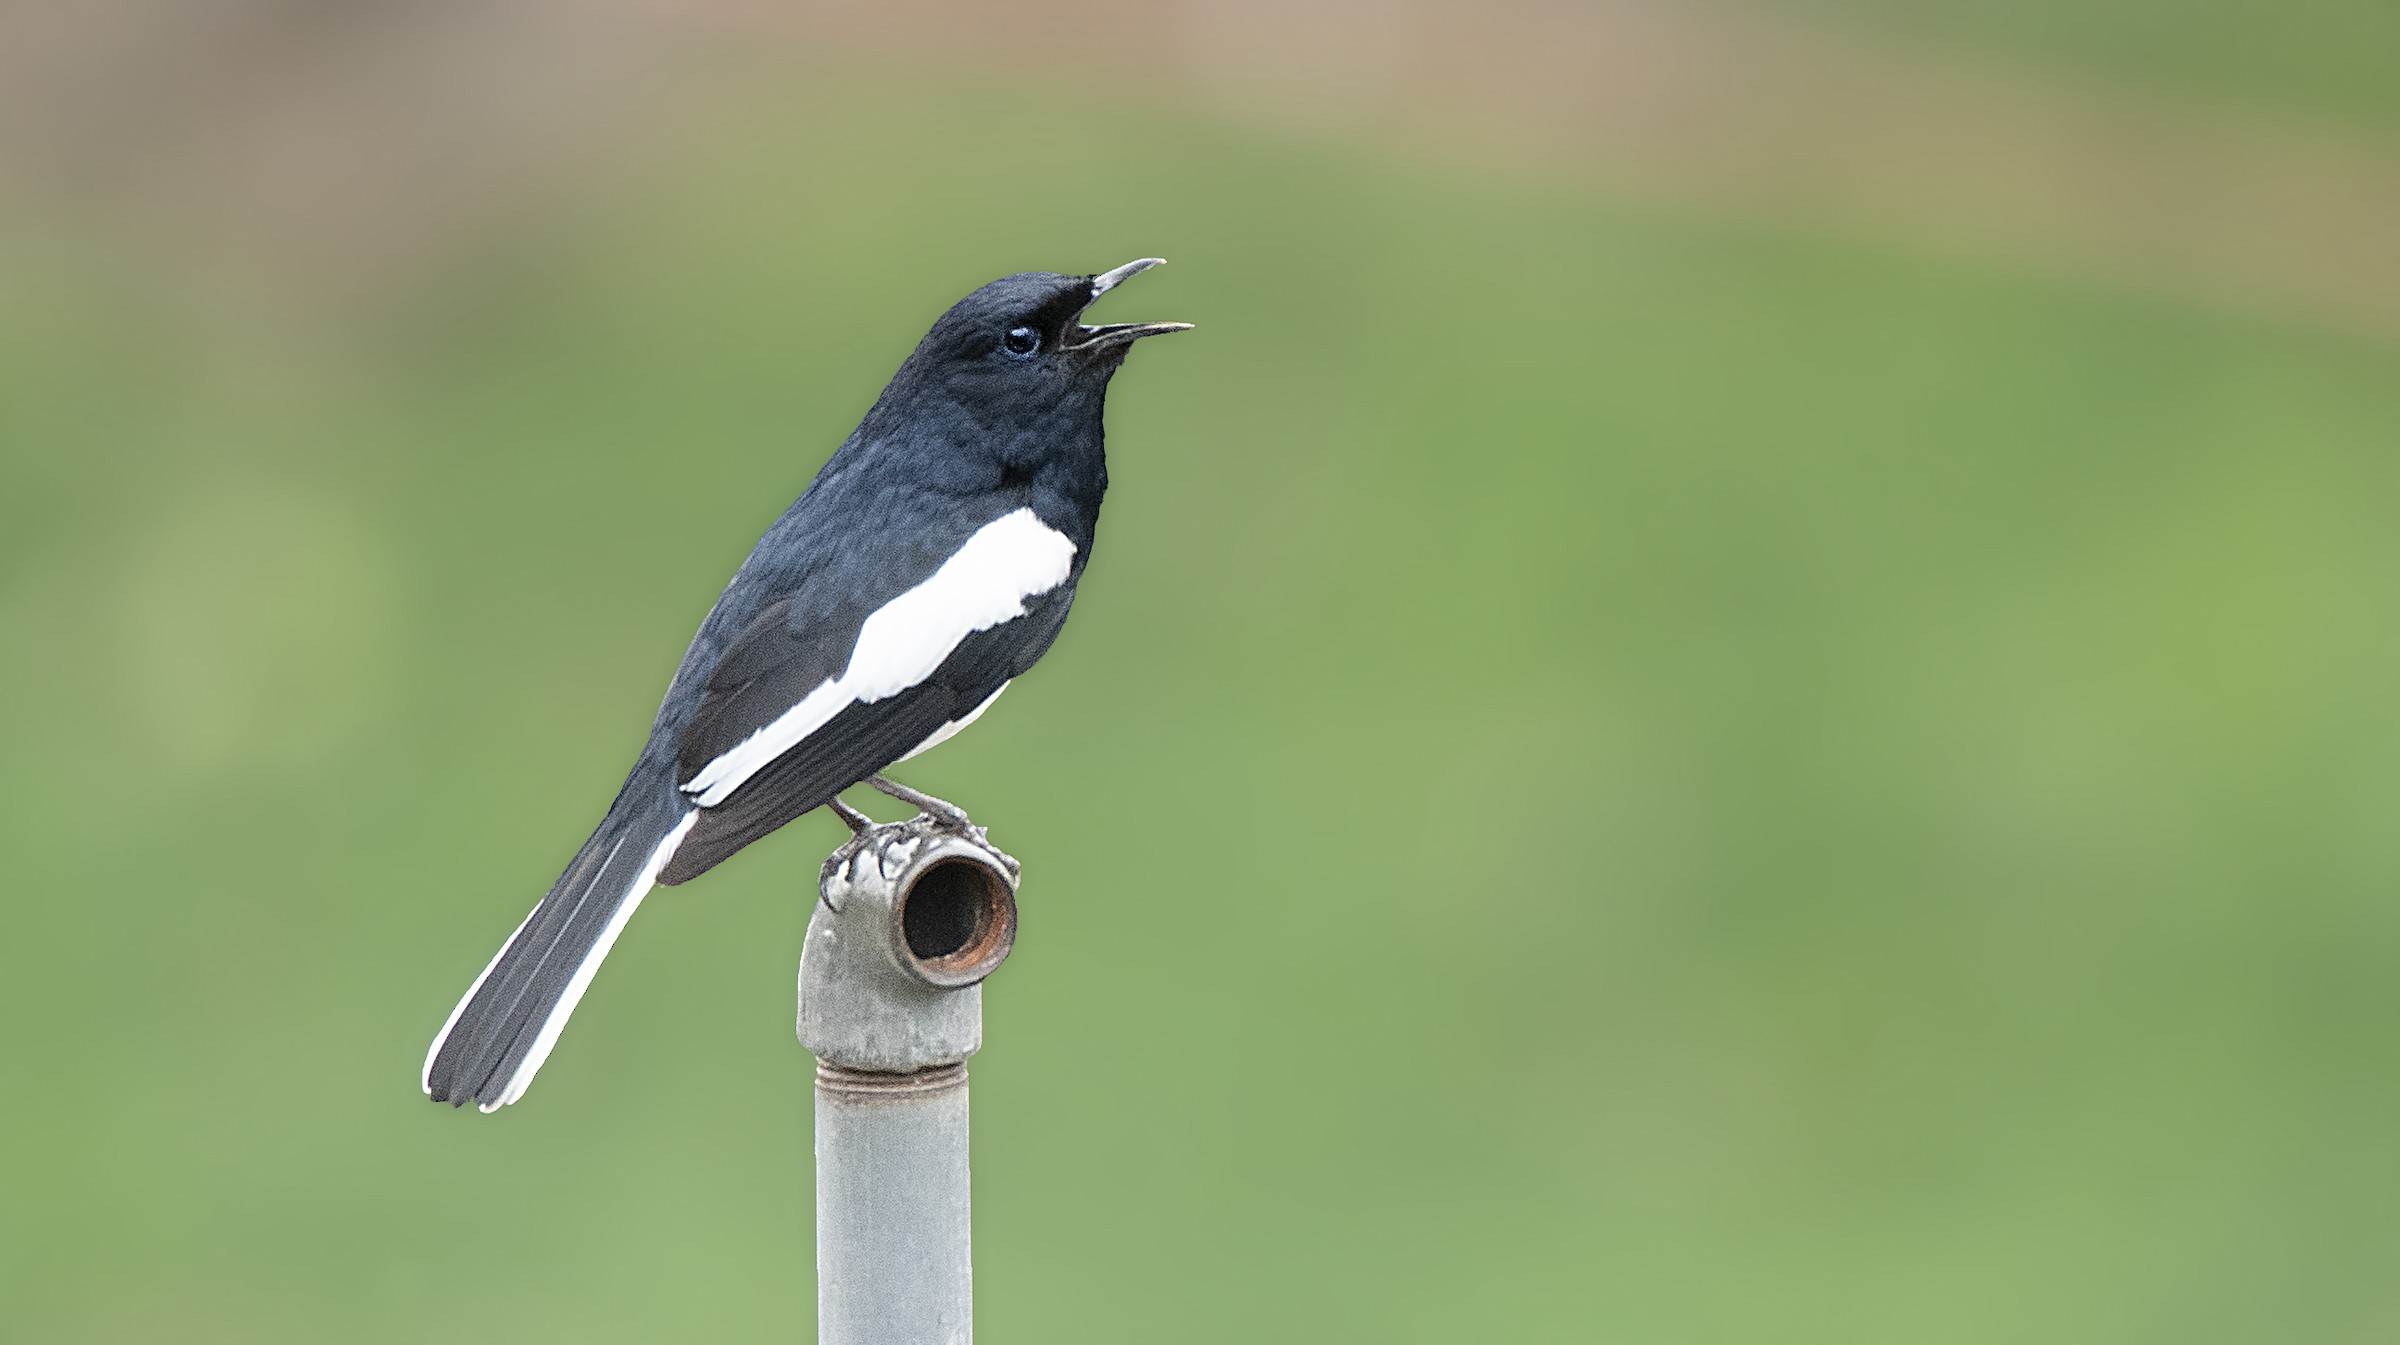 Lockdown Birding Challenge Results